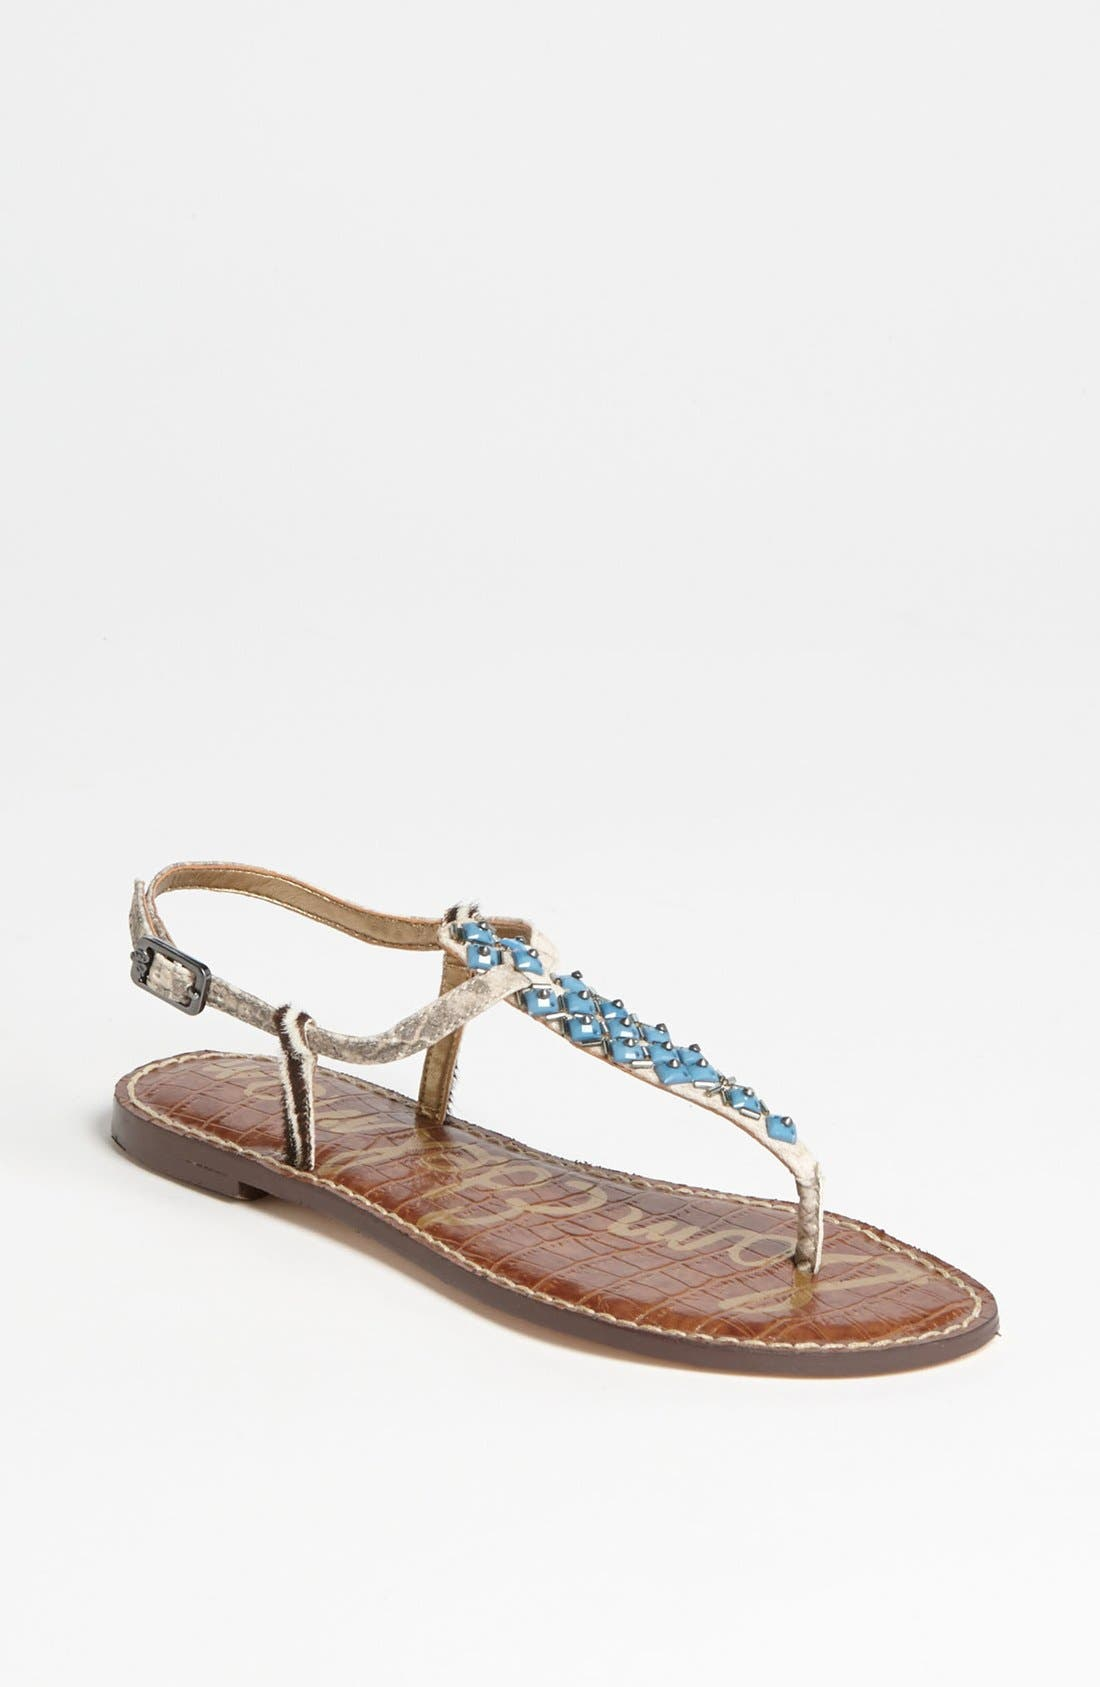 Alternate Image 1 Selected - Sam Edelman 'Gaines' Sandal